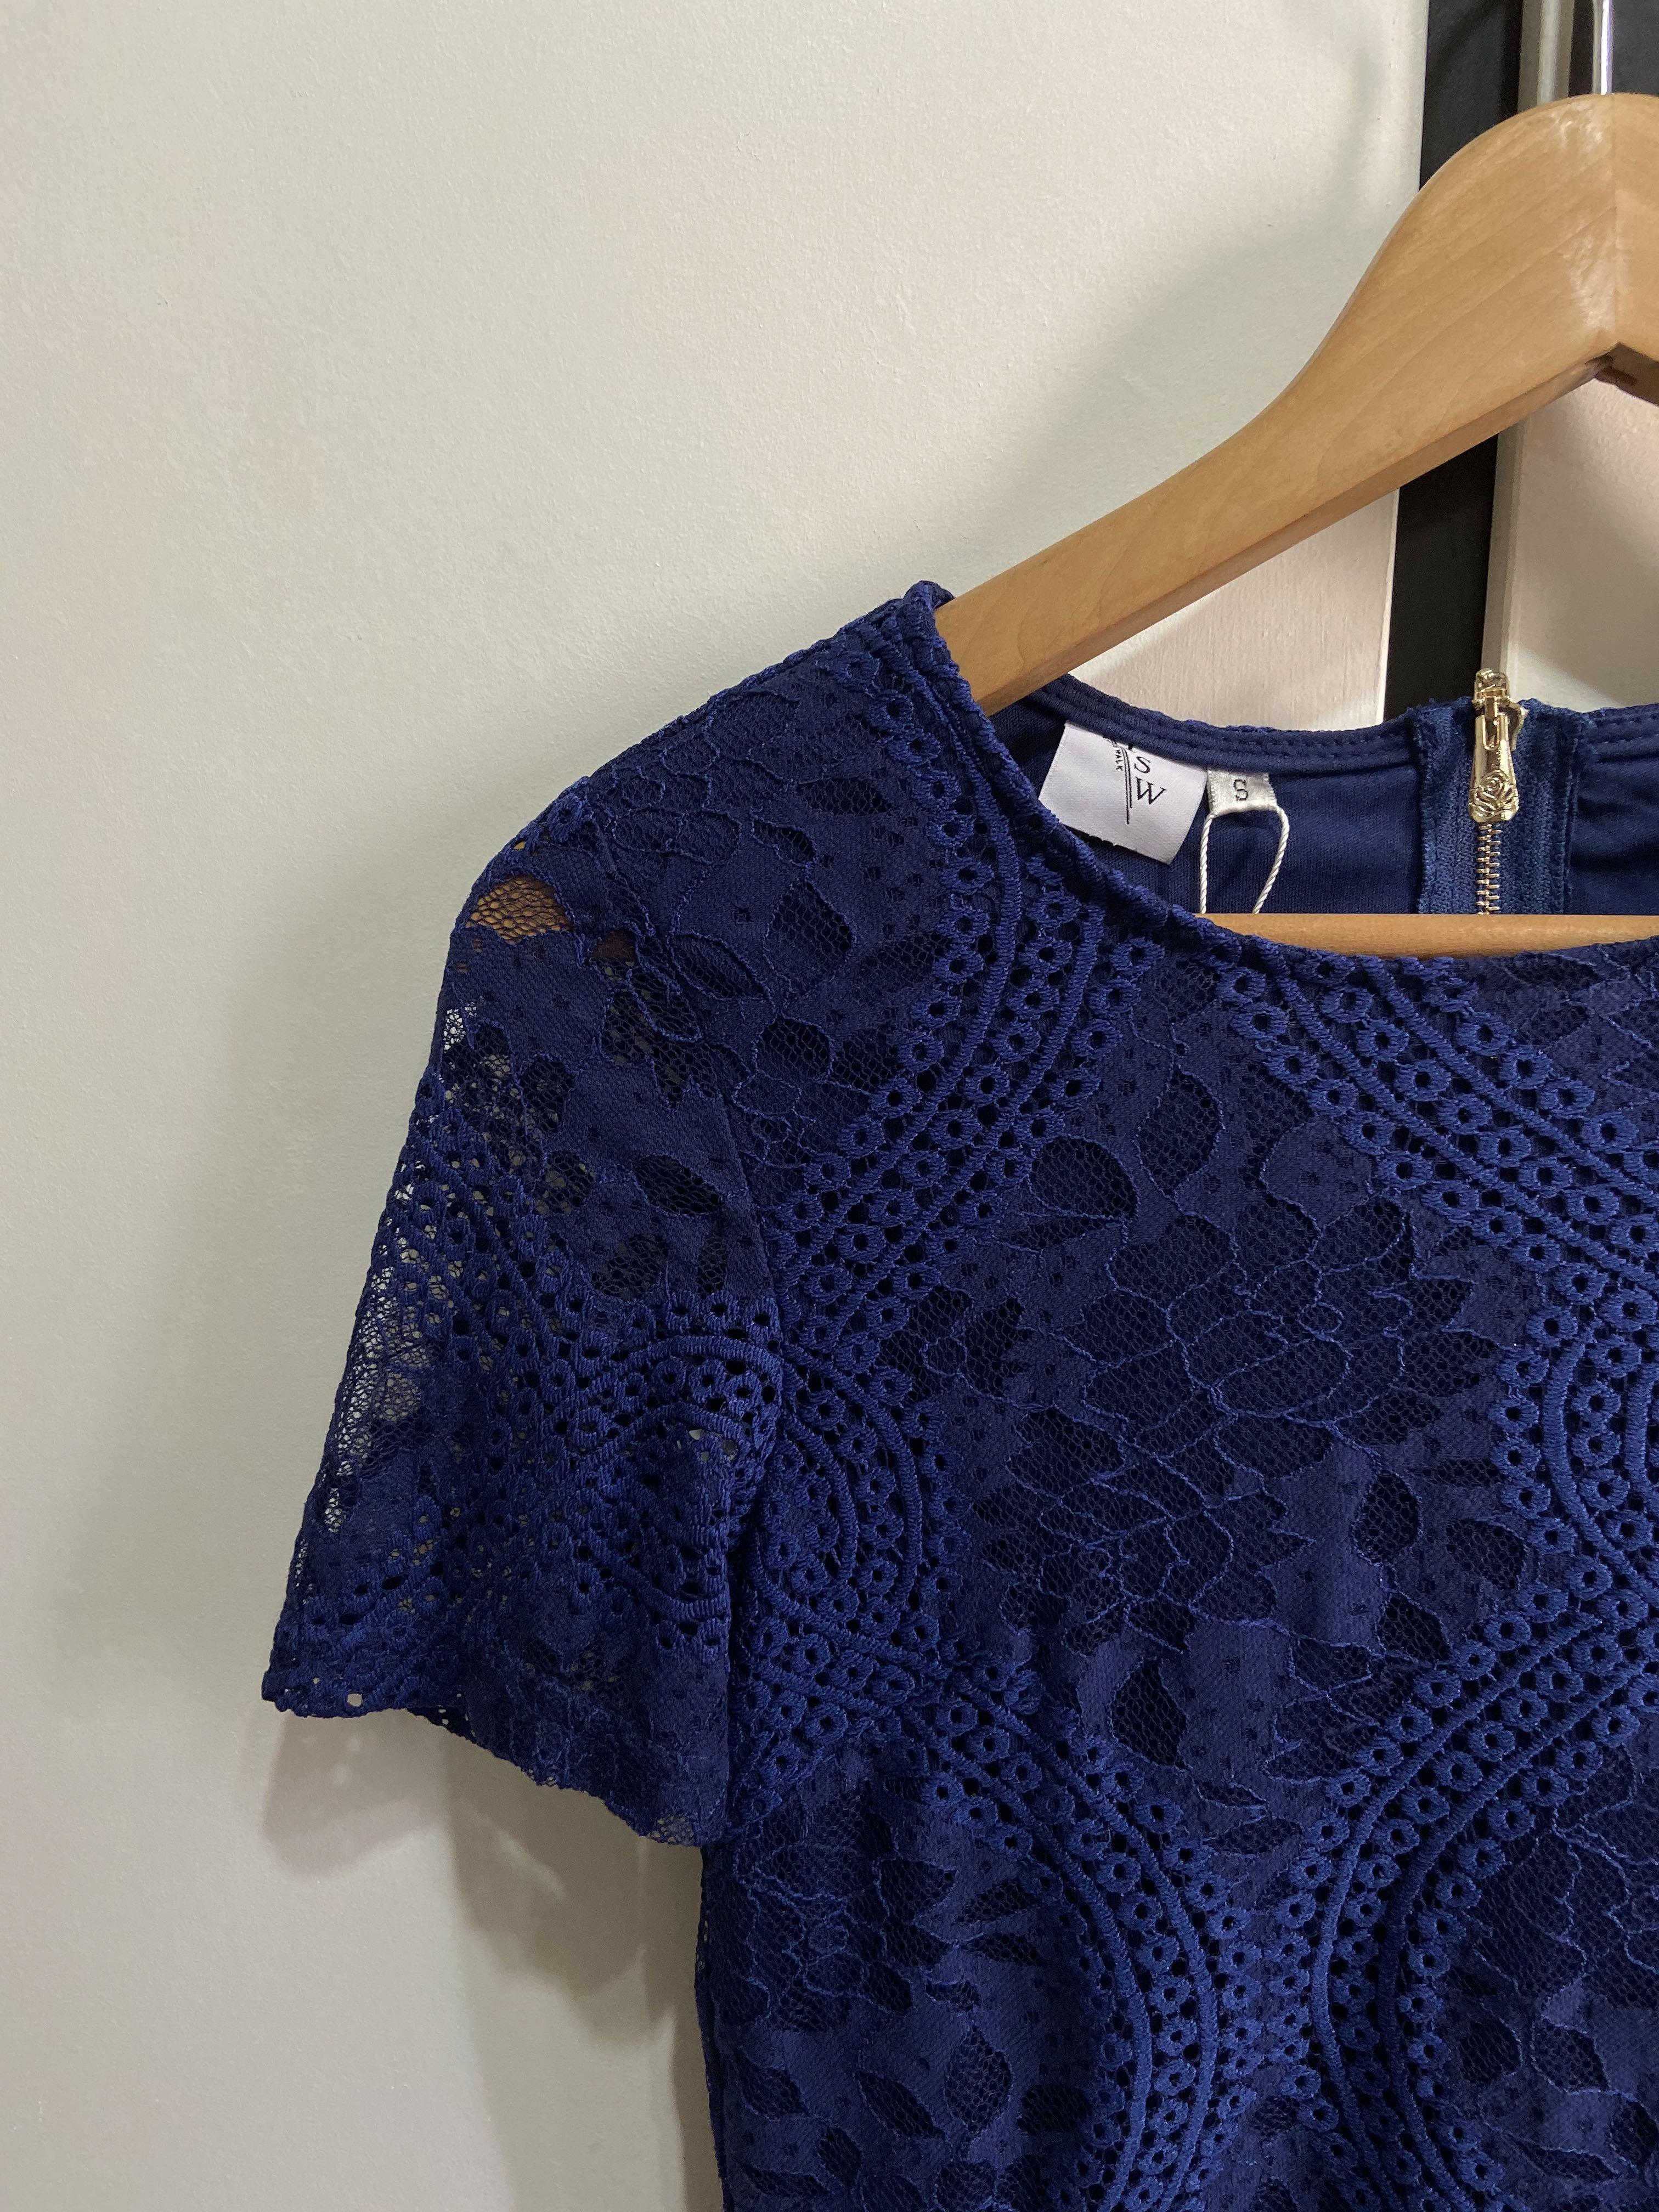 BNWT Royal Blue Lace Dress TSW